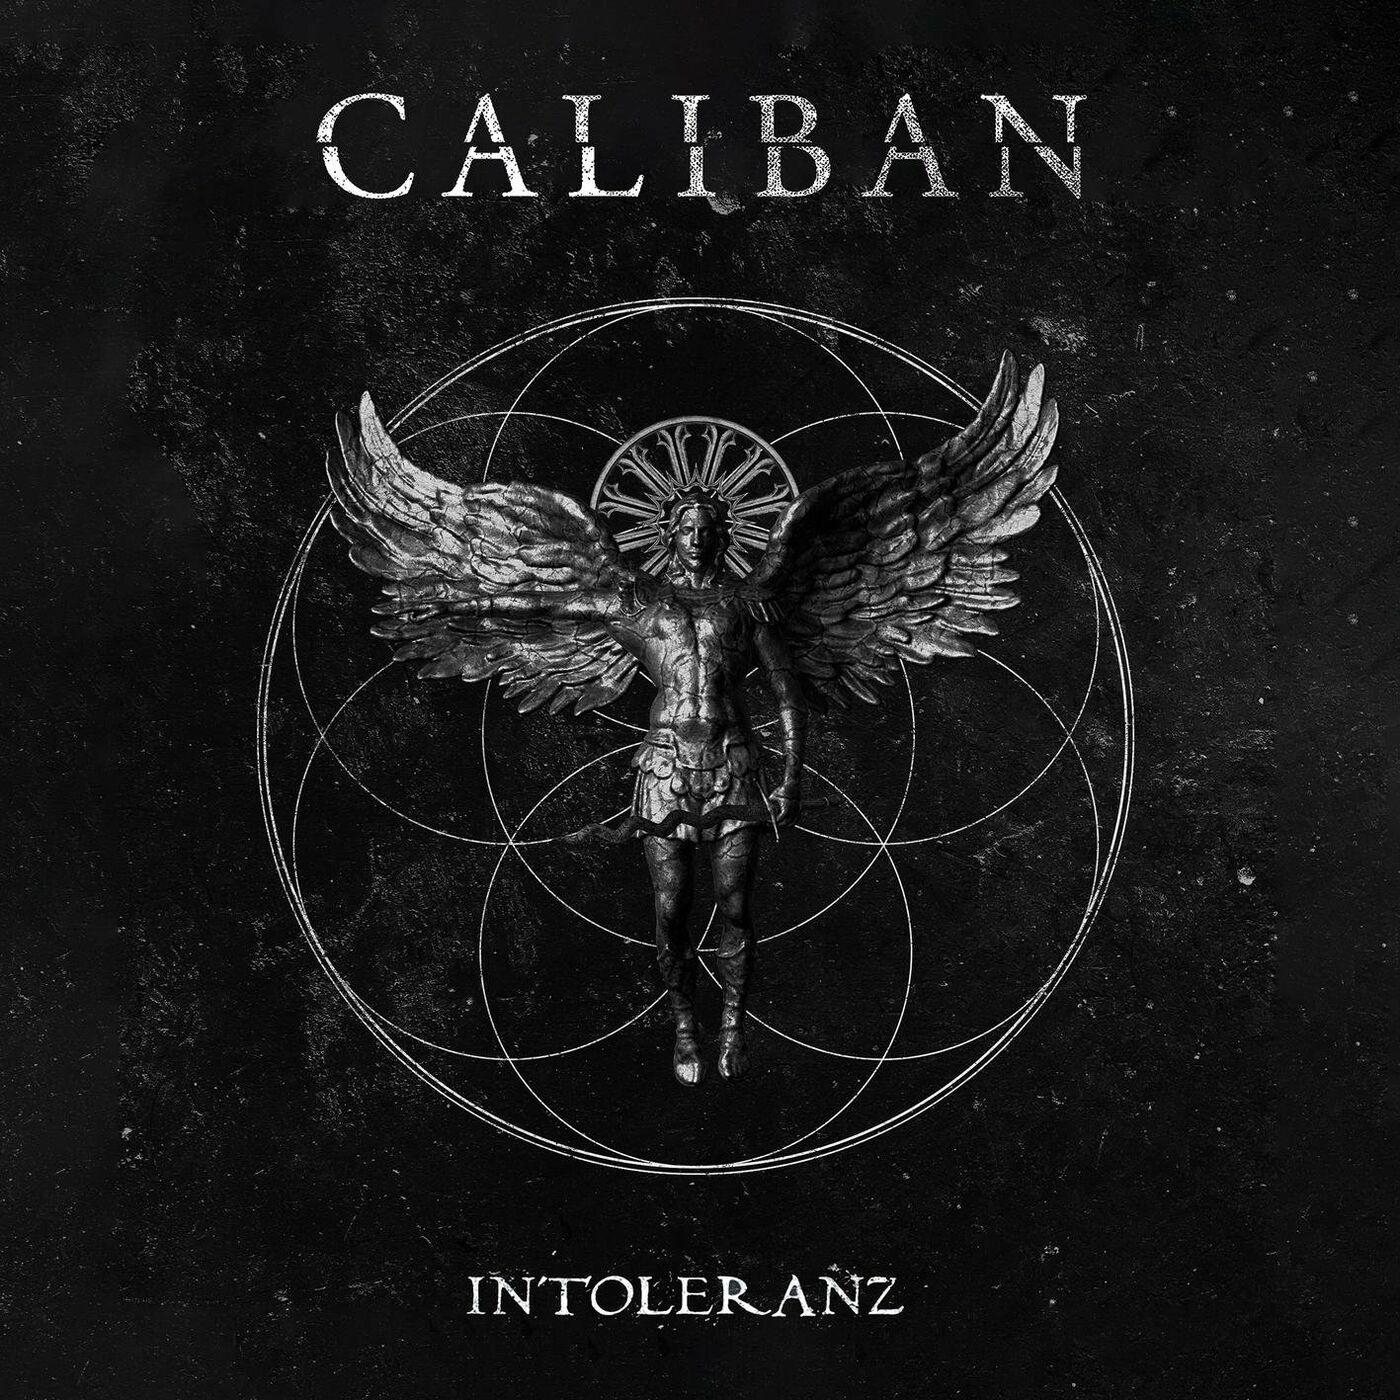 Caliban - Intoleranz [single] (2021)